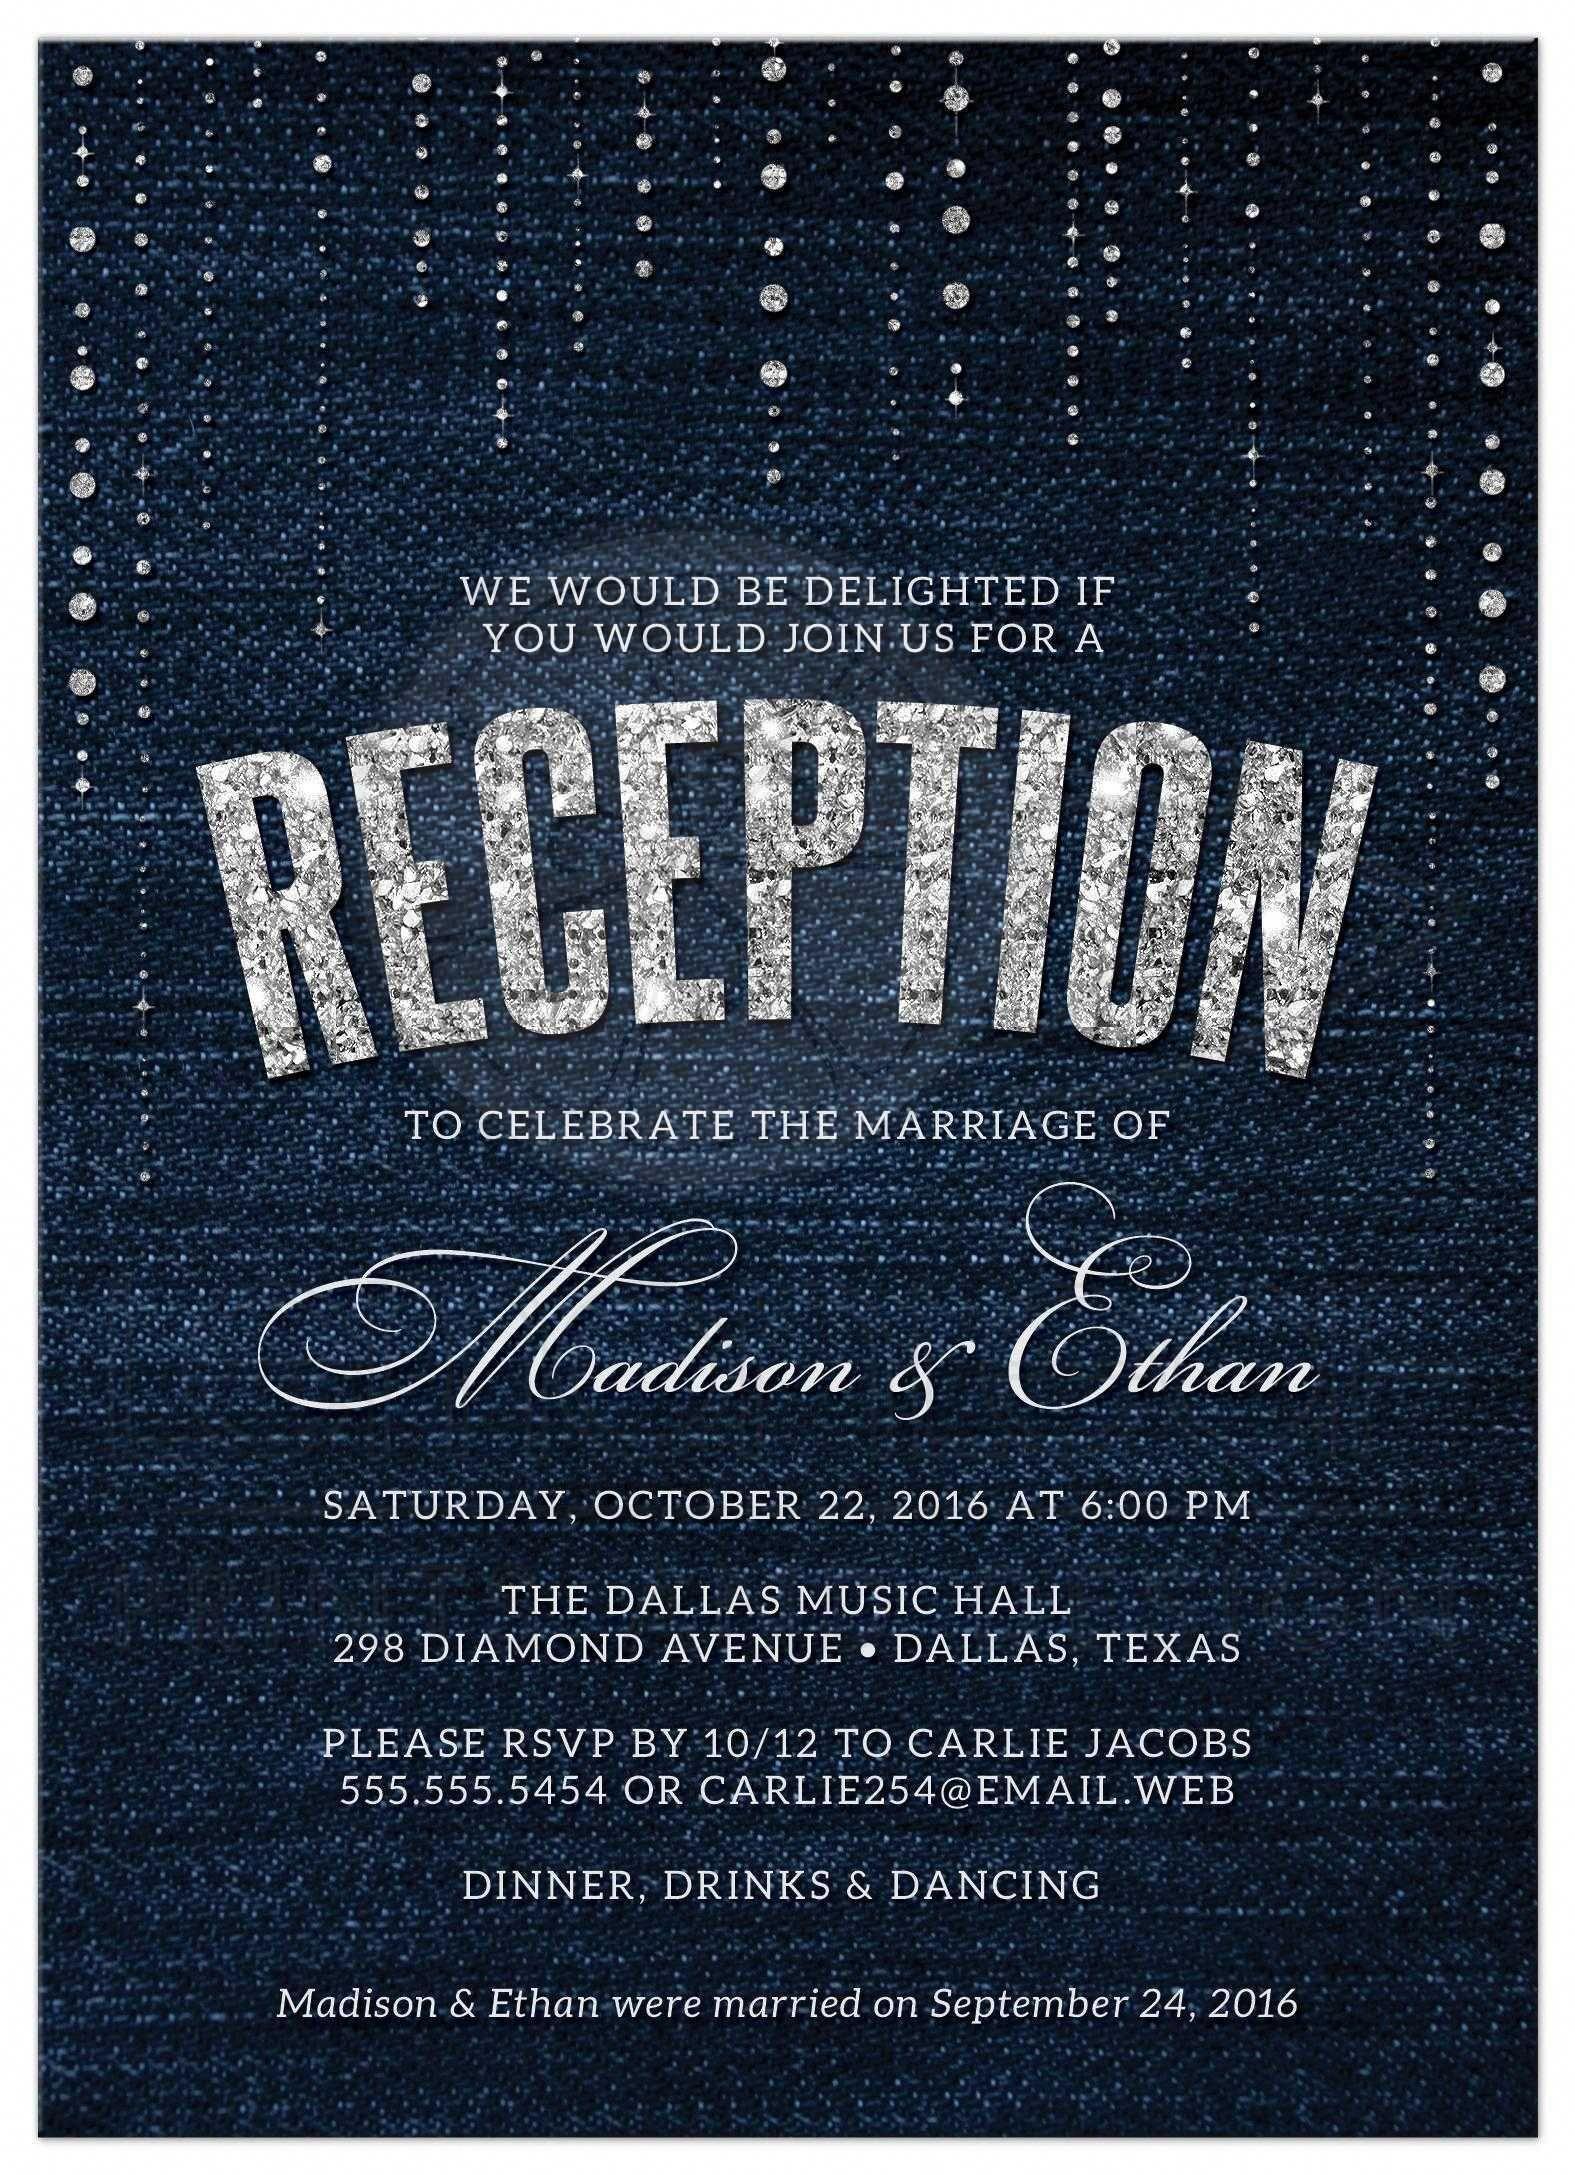 Post Wedding Reception Only Invitations Denim & Diamonds